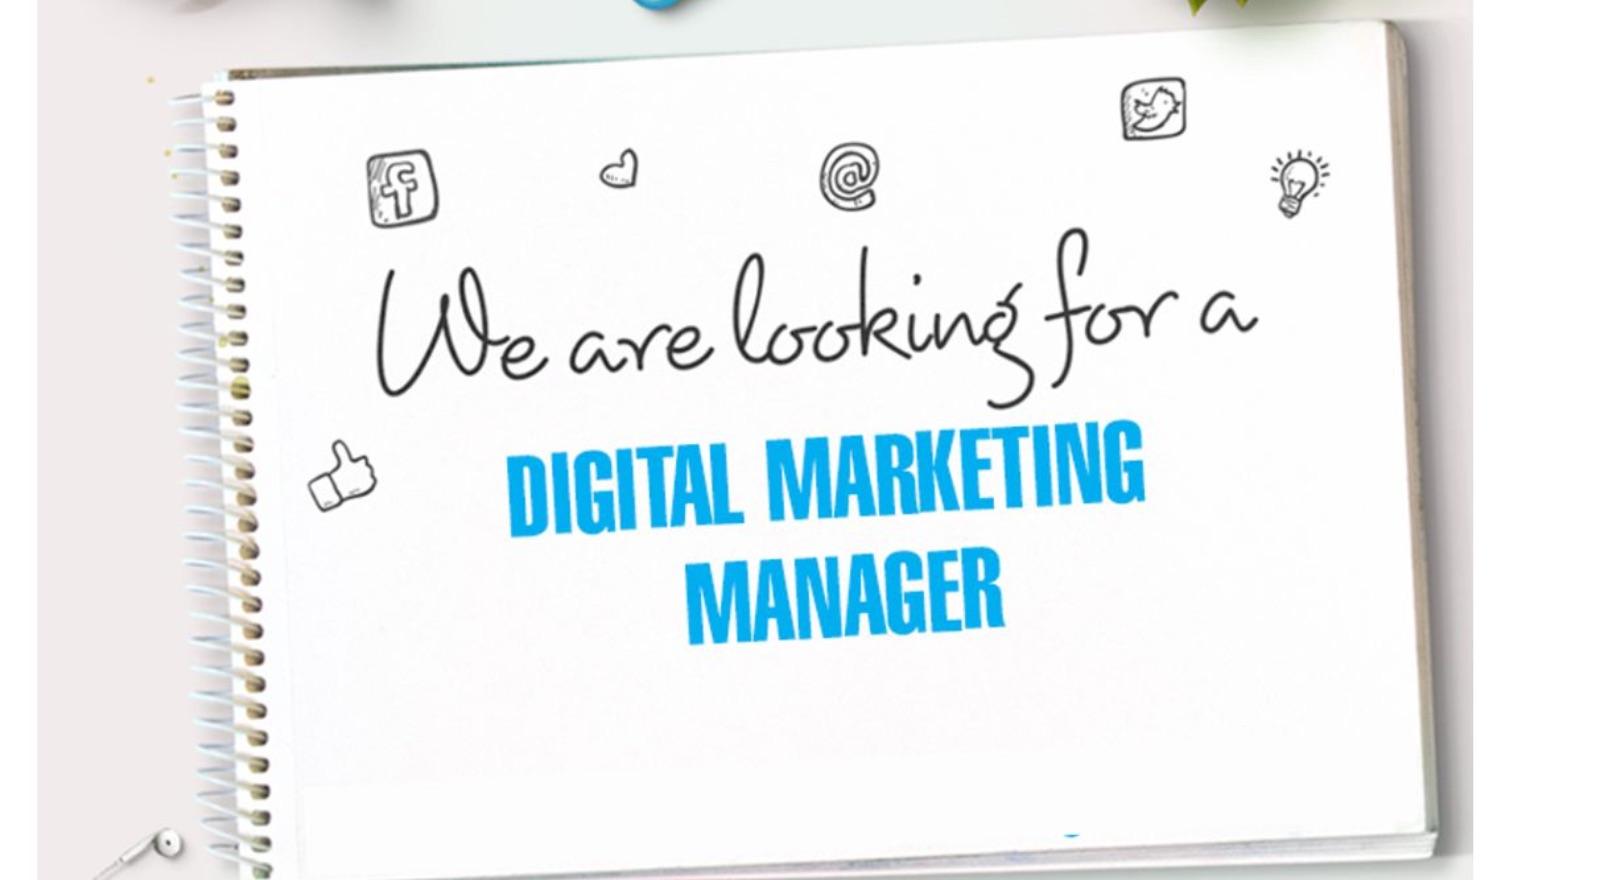 Digital Marketing Manager at undefined